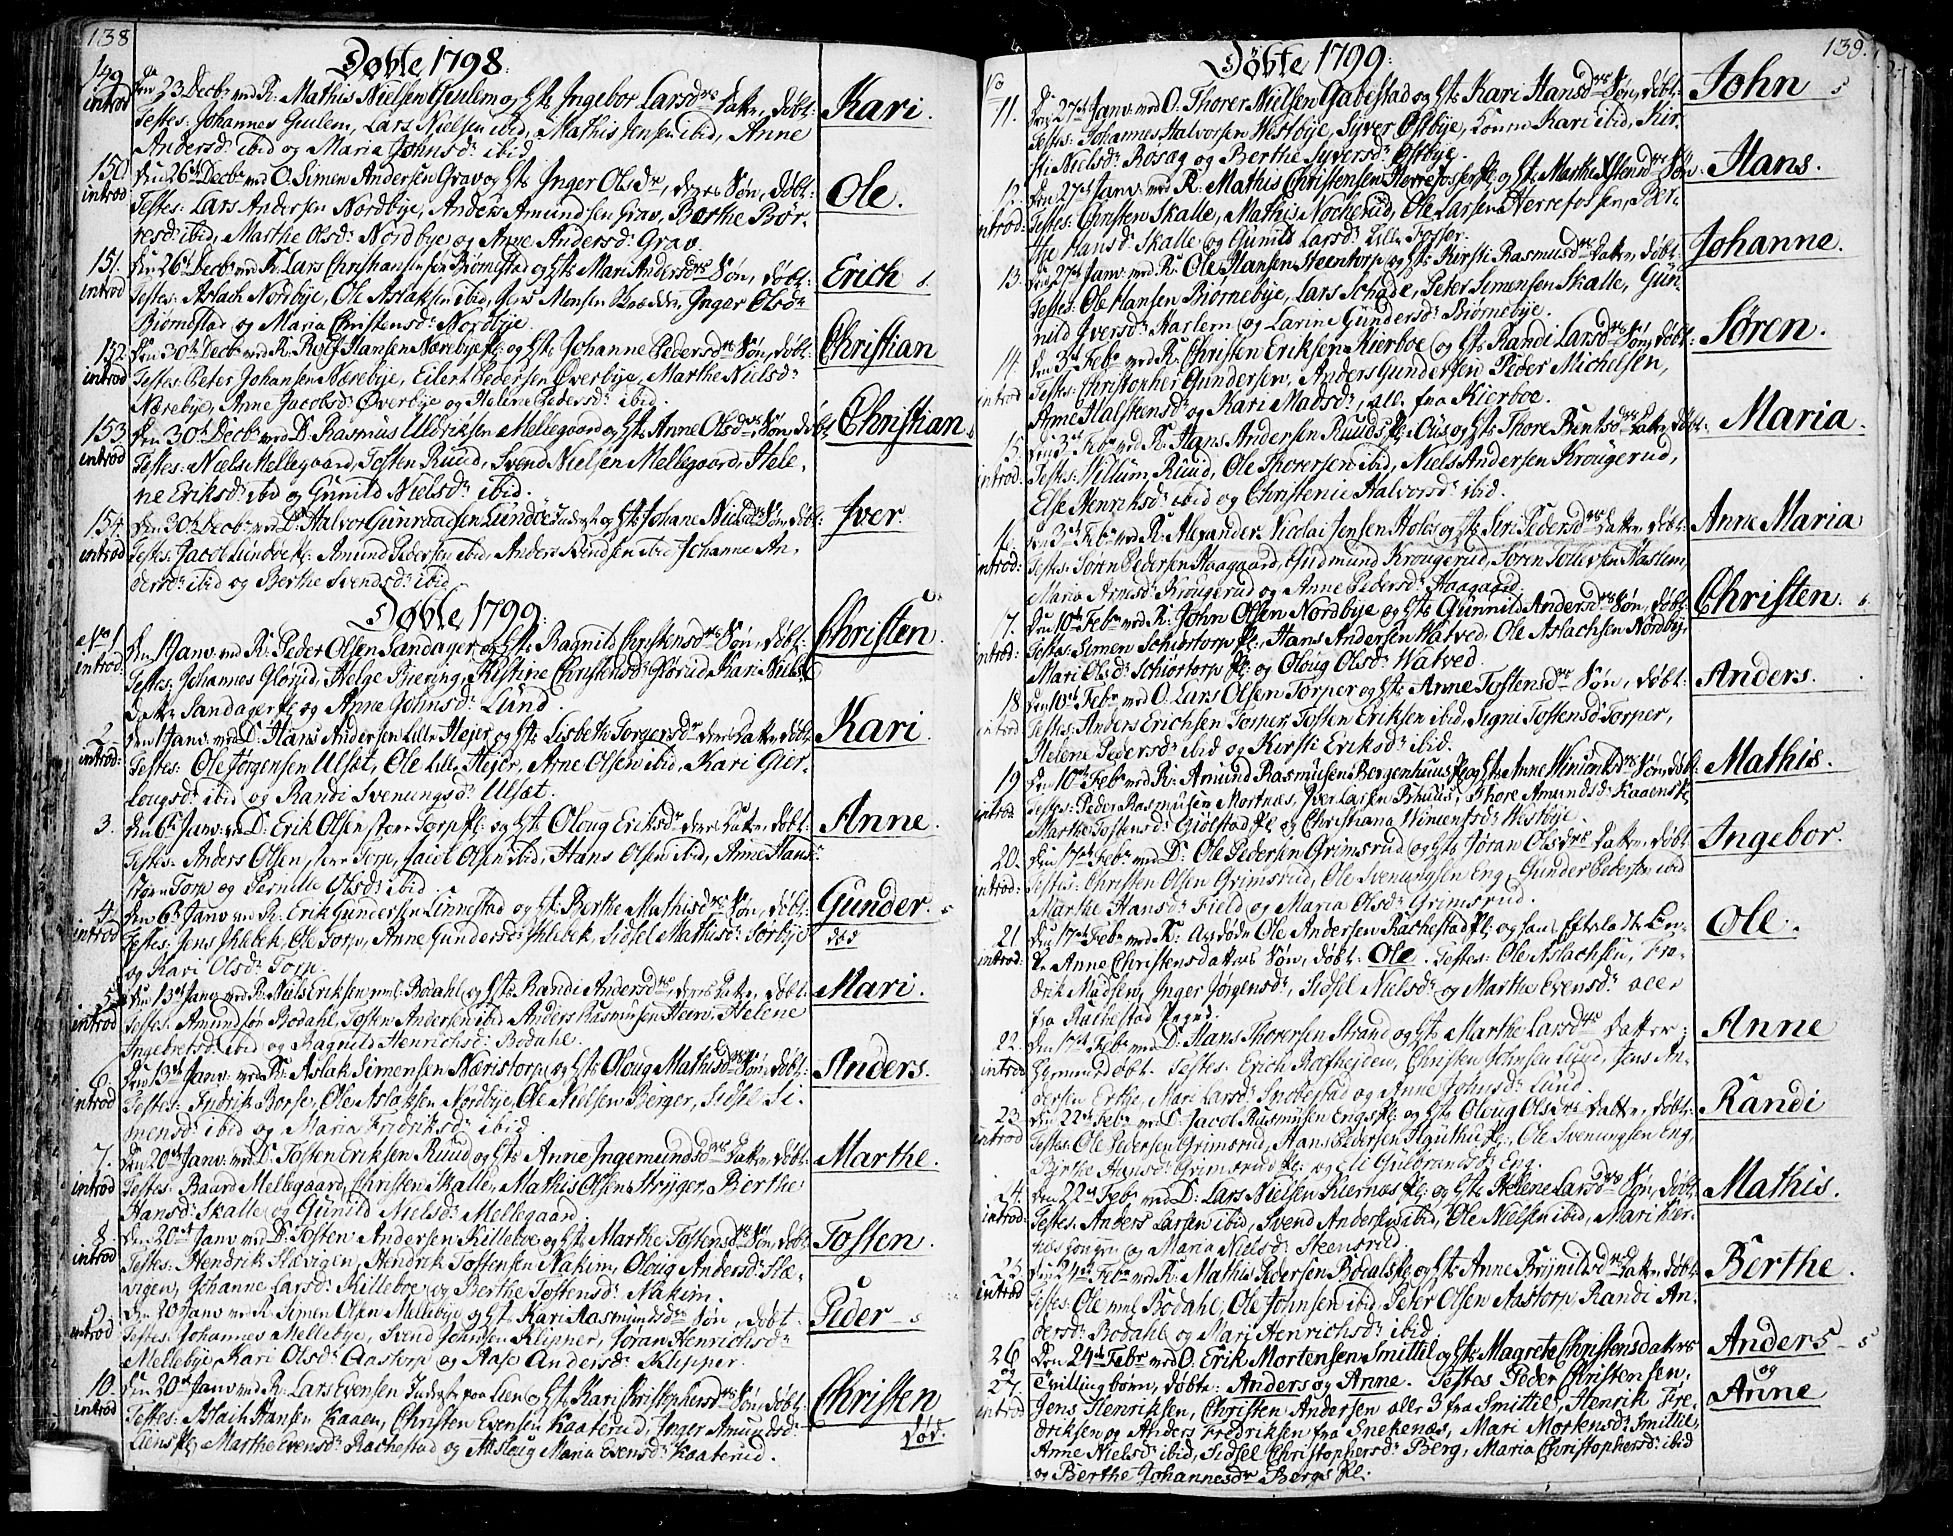 SAO, Rakkestad prestekontor Kirkebøker, F/Fa/L0005: Ministerialbok nr. I 5, 1784-1814, s. 138-139